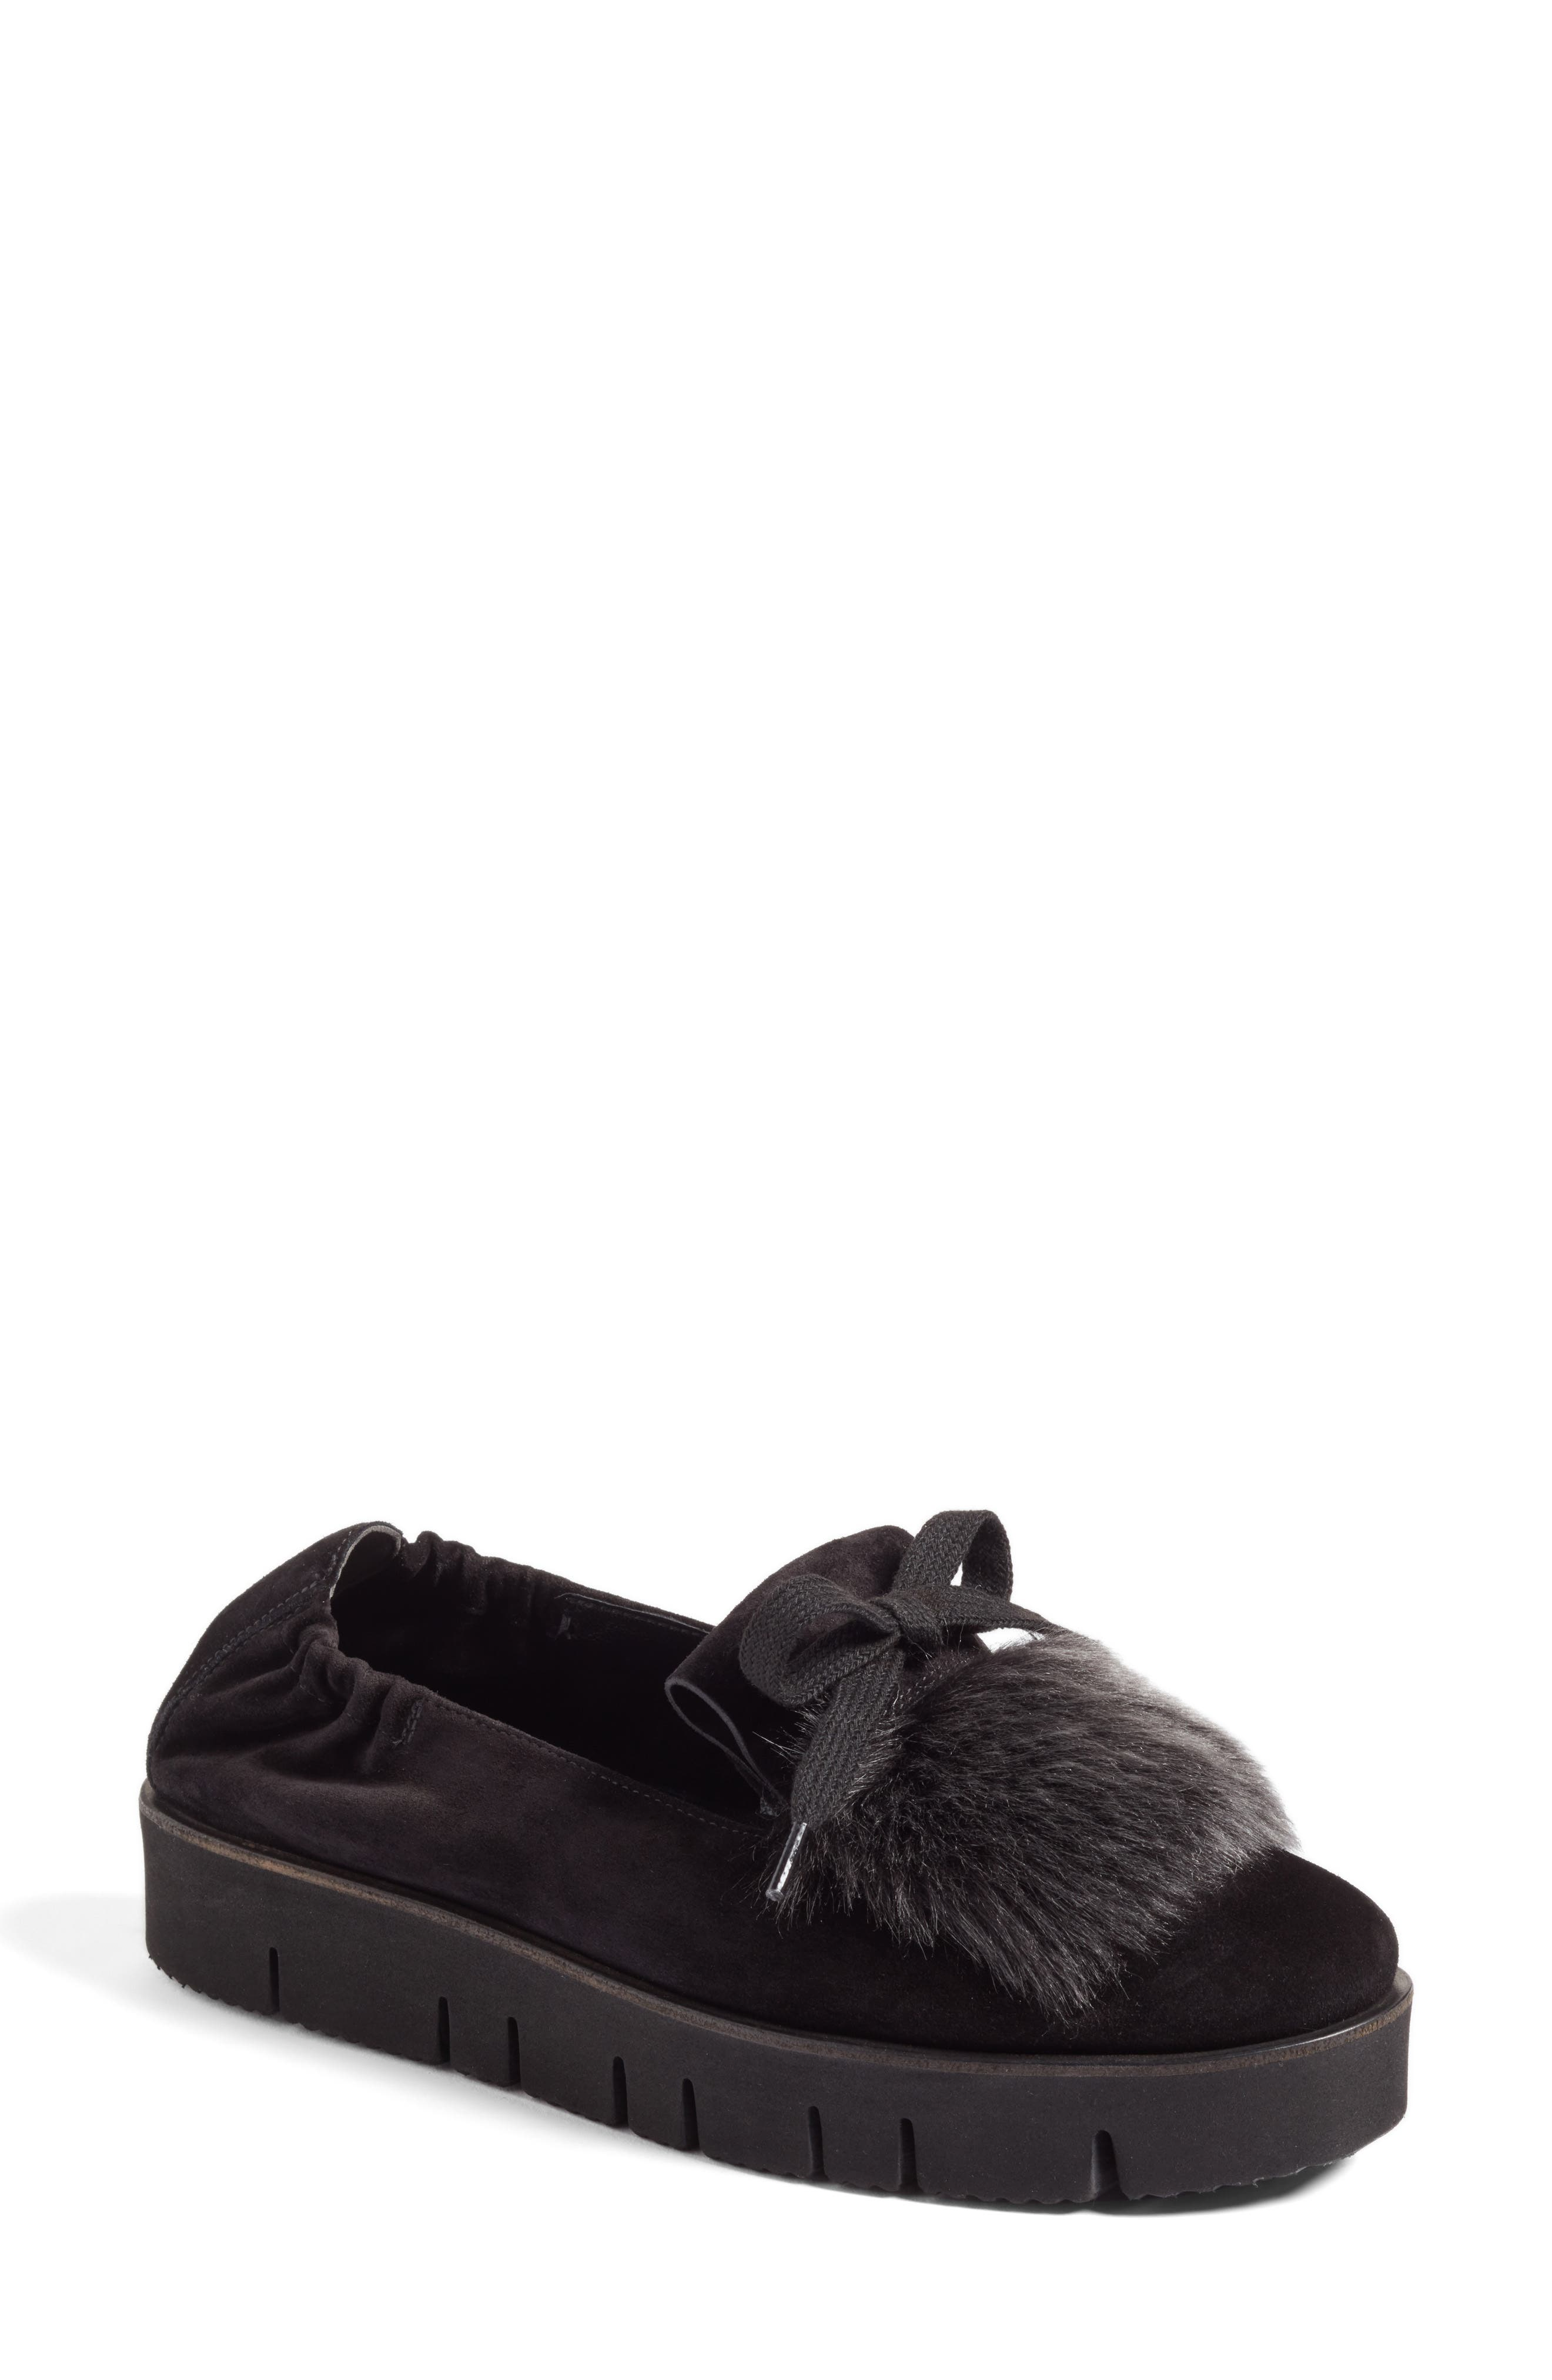 Kennel & Schmenger Malu Suede & Genuine Shearling Slip-On Sneaker,                         Main,                         color, Black